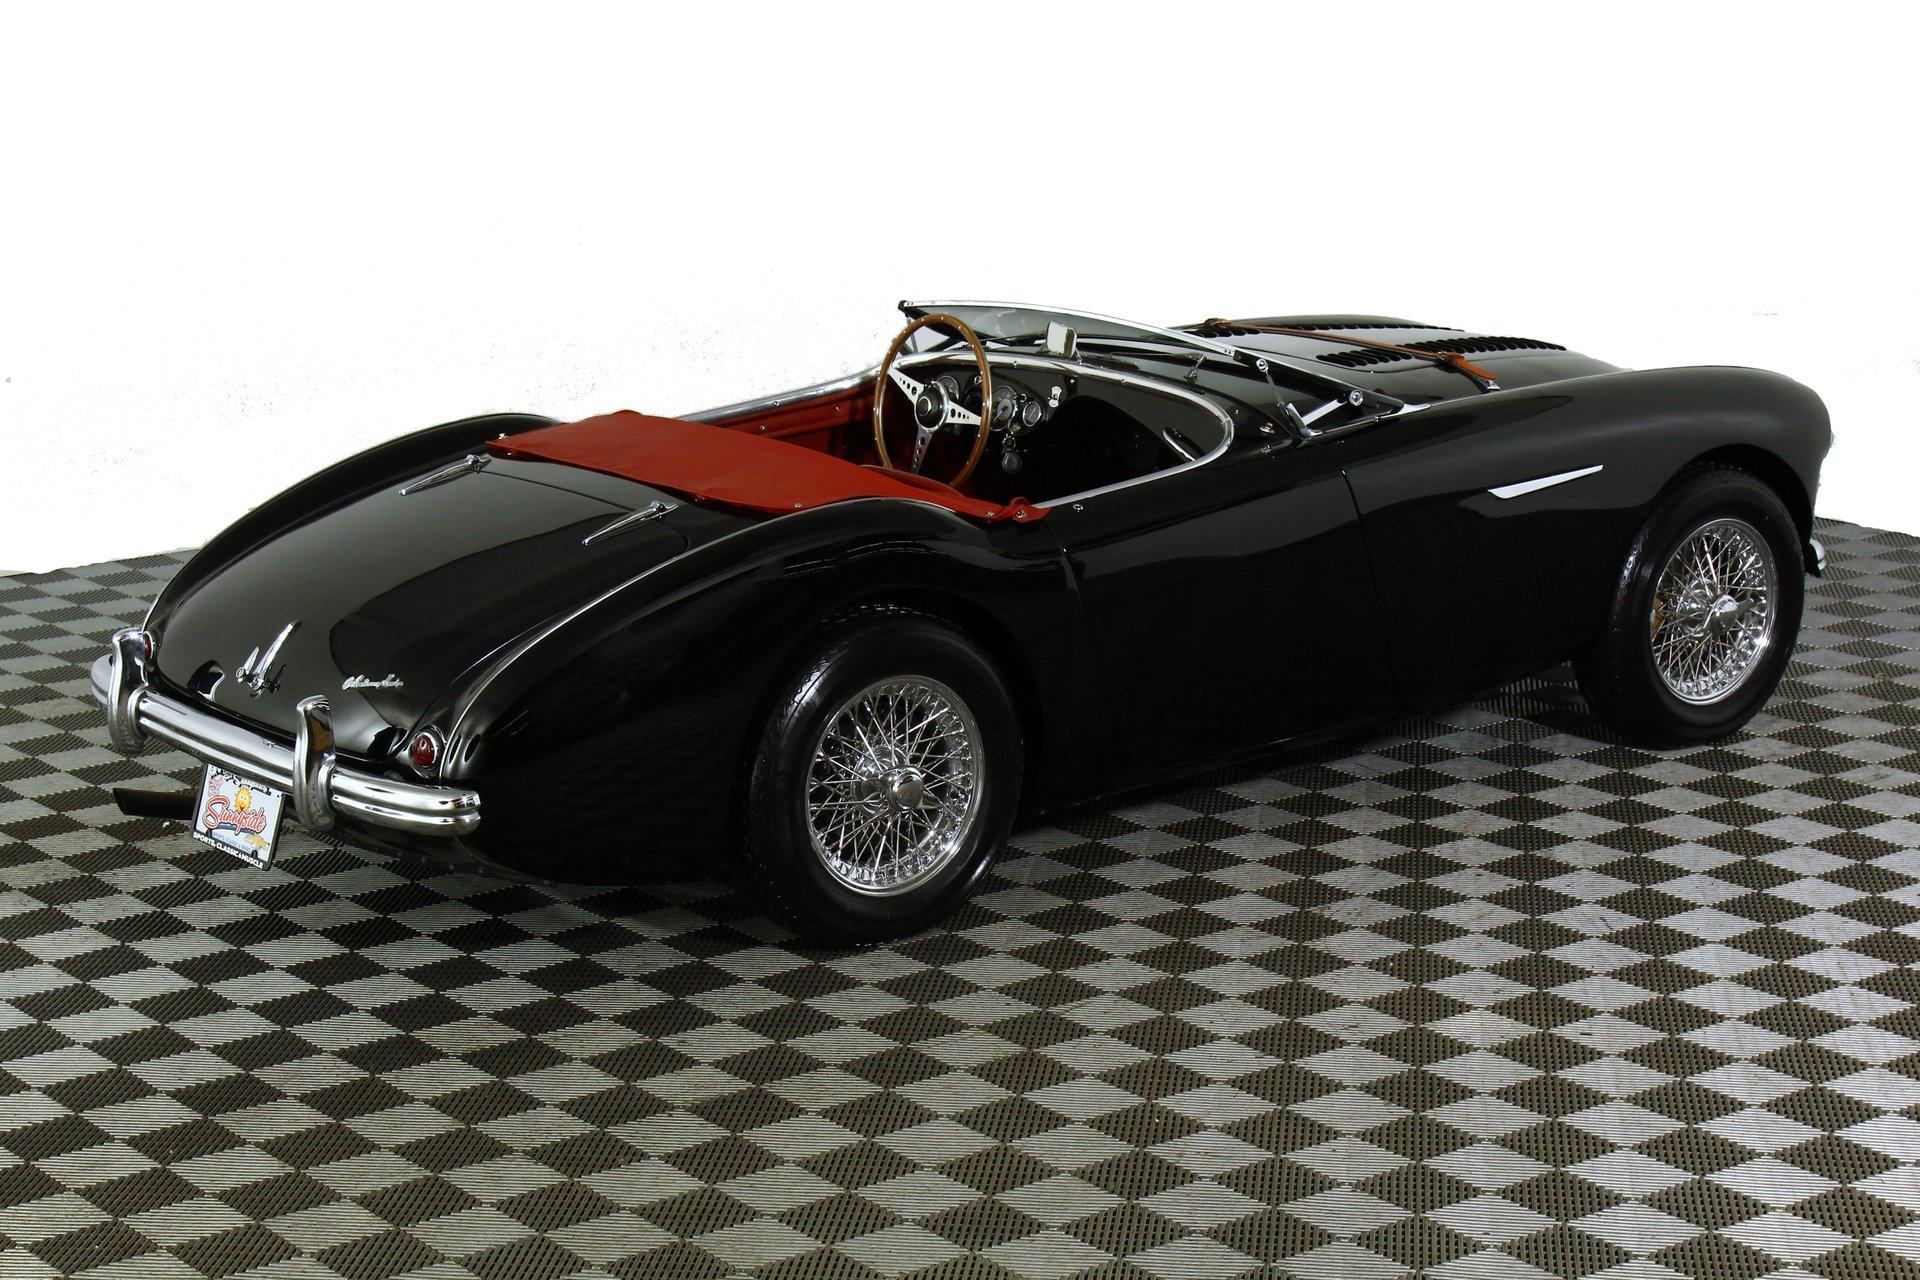 1955 Austin-Healey 100/4 M Conversion